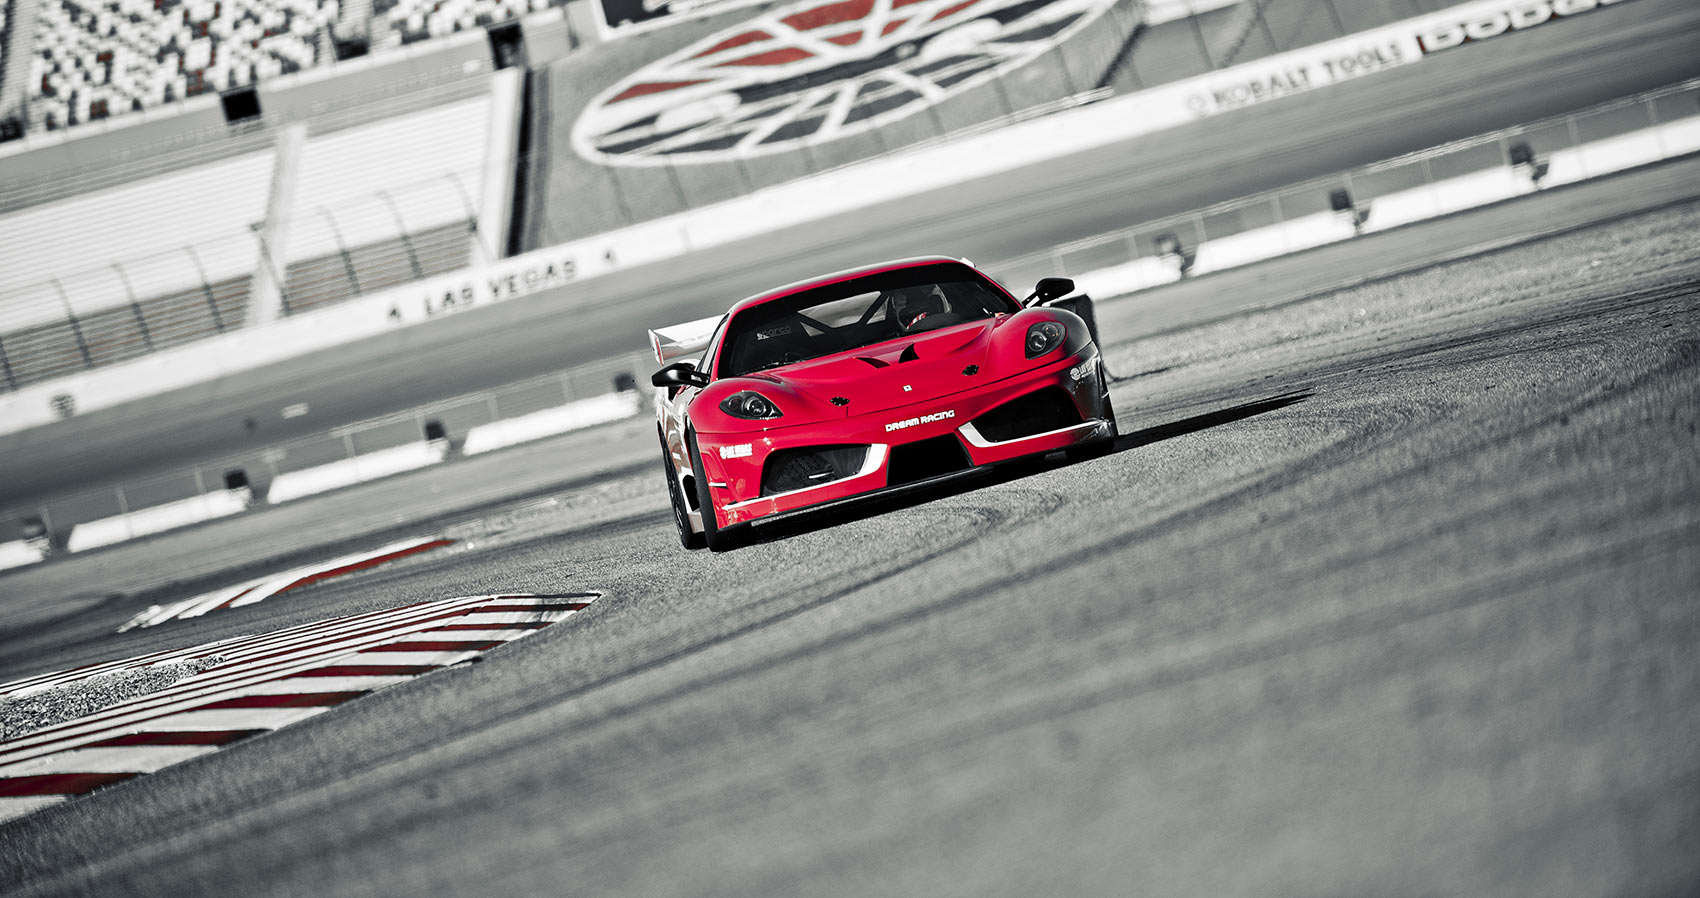 Car-on-track